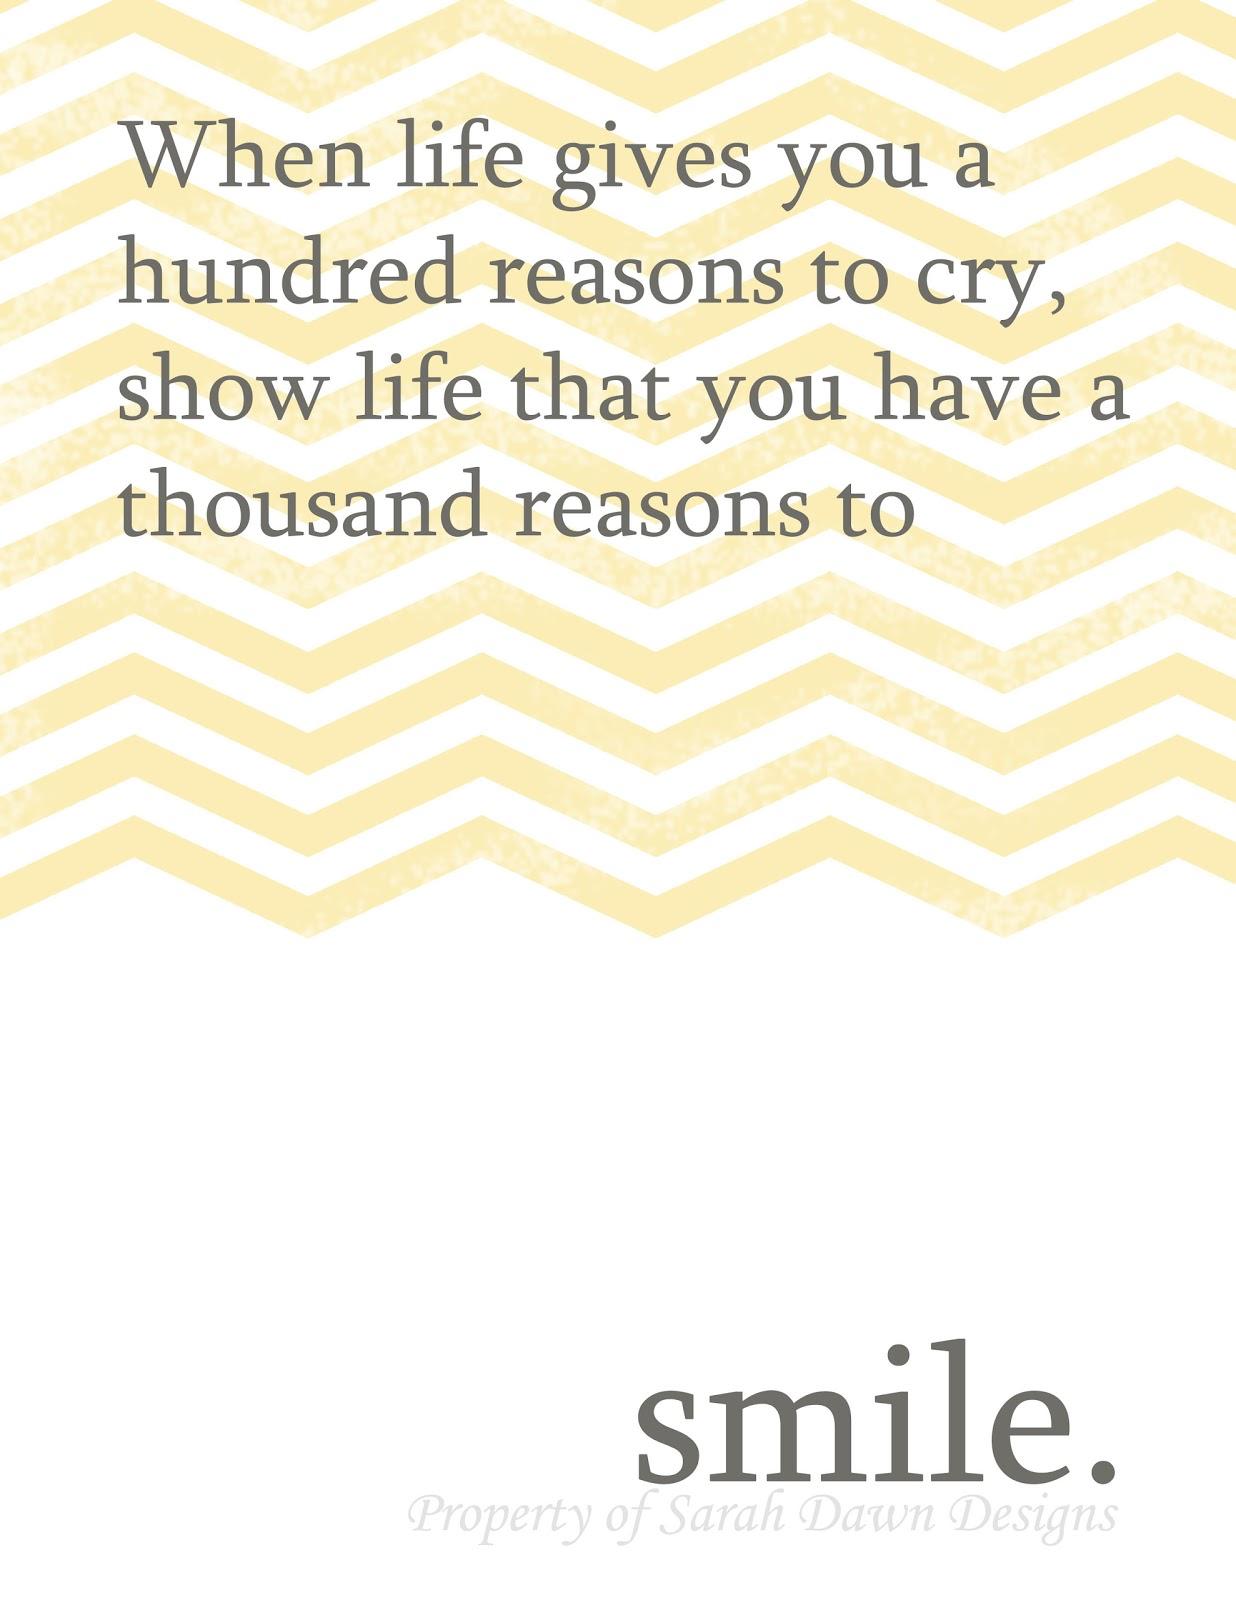 Quotes That Make You Smile: Sarah Dawn Designs: Printable Quotes To Make You Smile